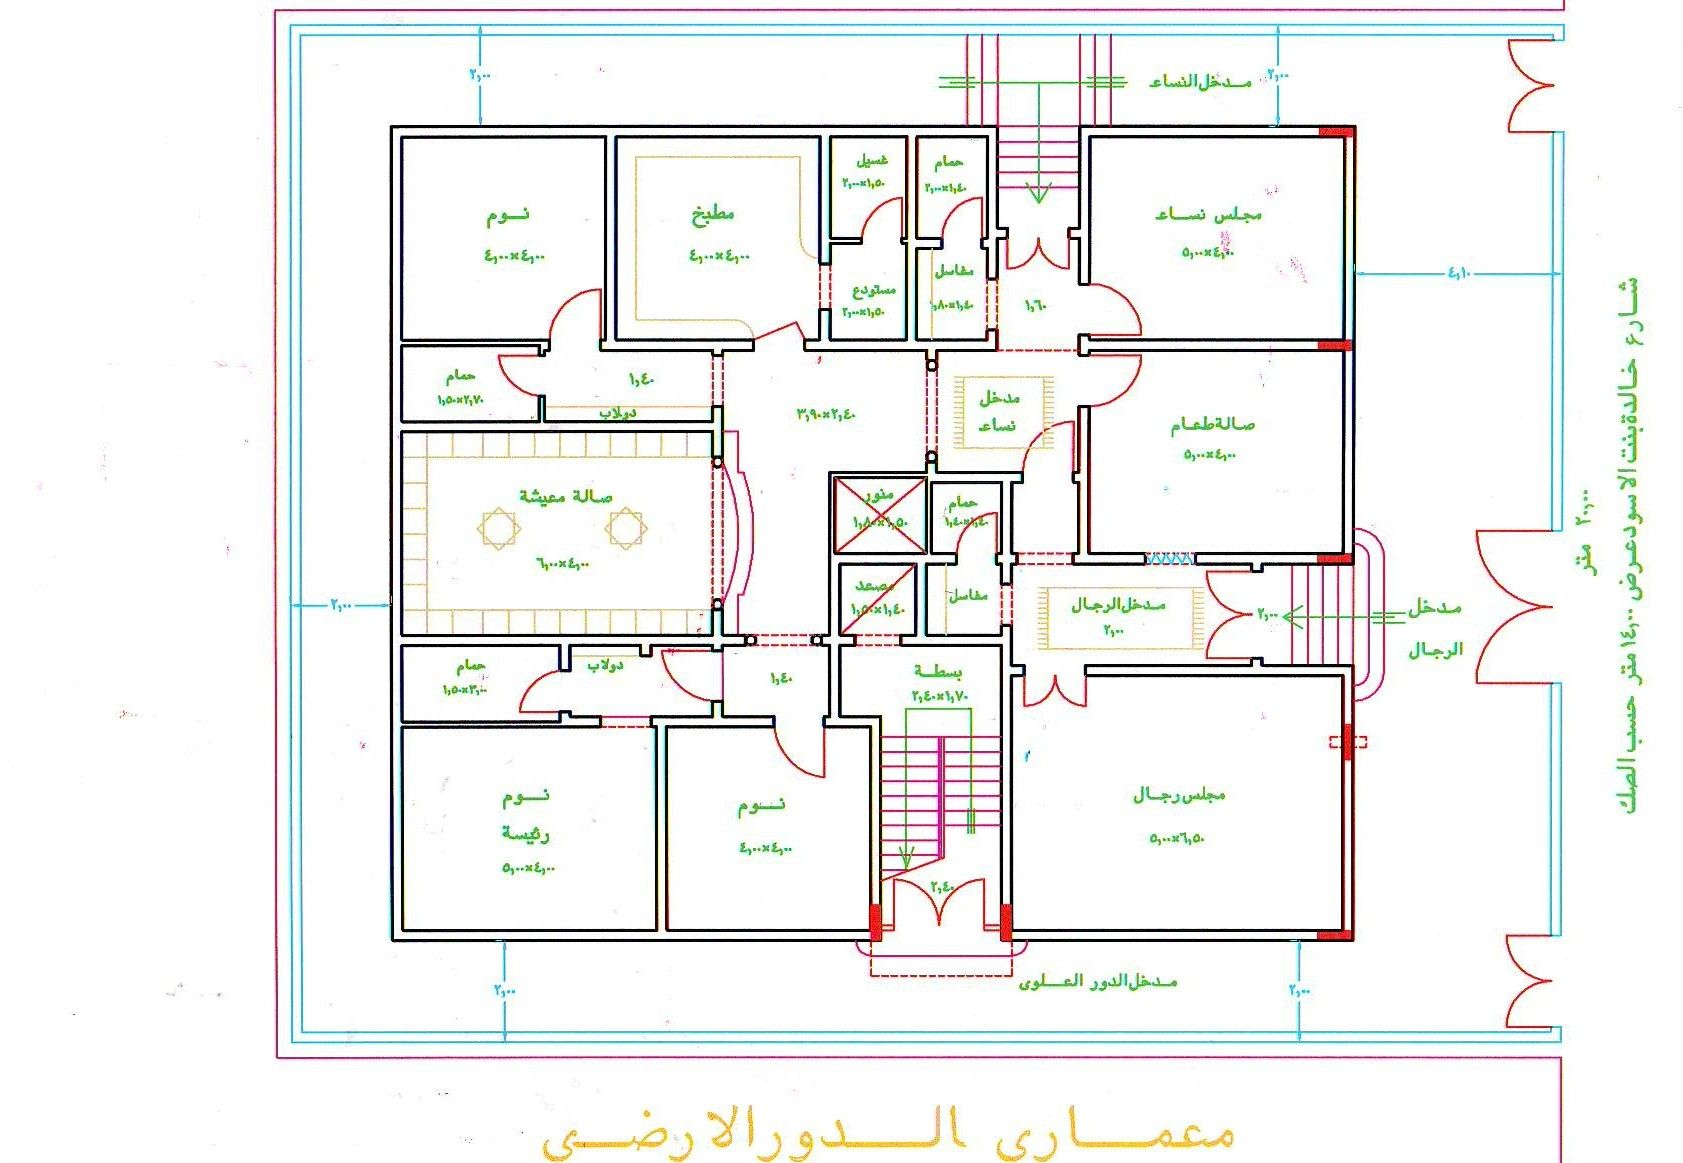 من يبحث عن مخططات دور ارضي كامل هنا مخططات رائعه منتديات شبكة المهندس Square House Plans House Layout Plans Model House Plan